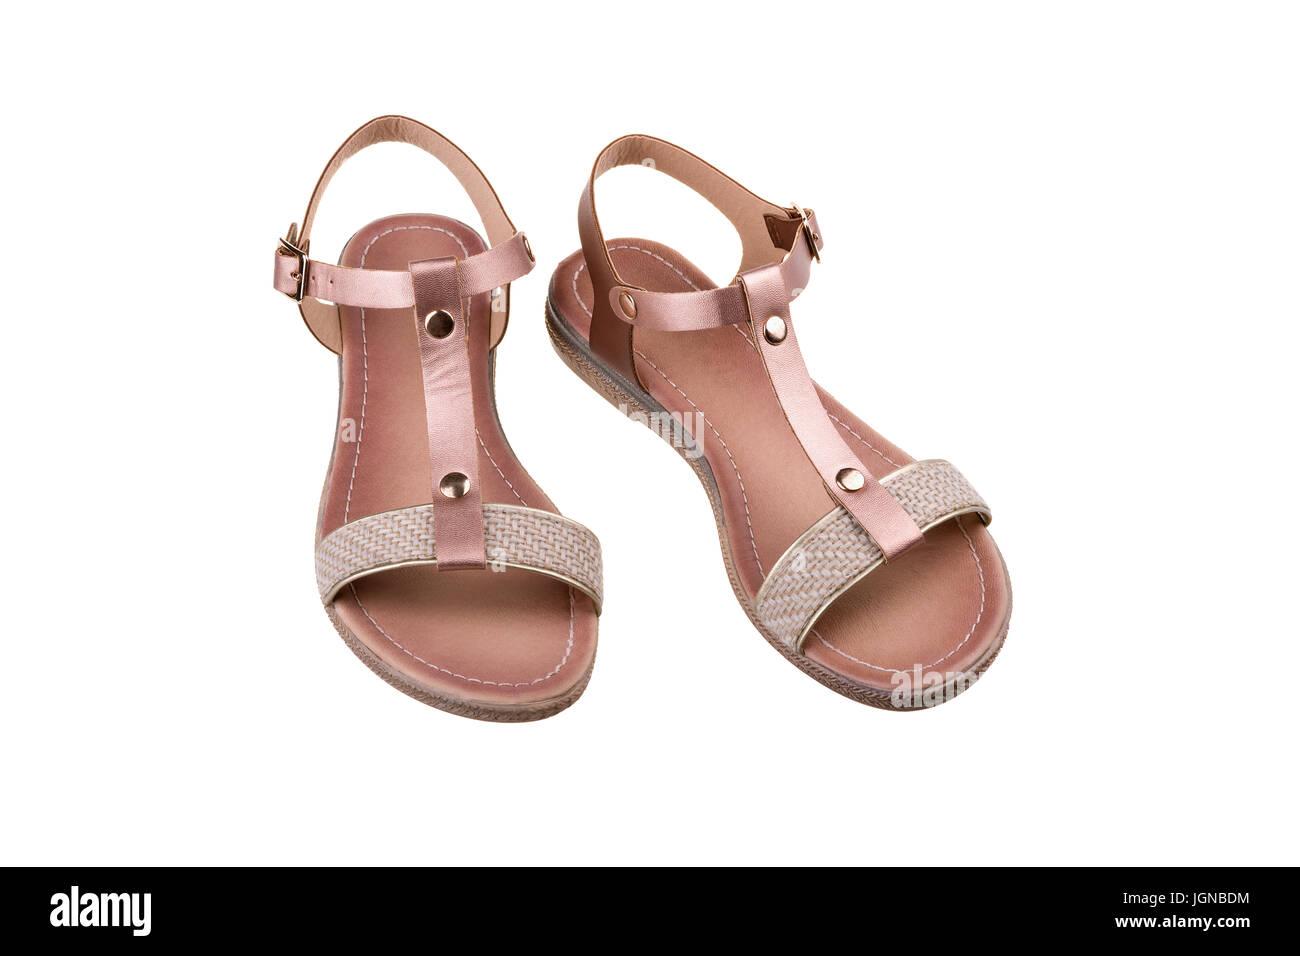 8b3051ce0e032 Female Feet Leather Sandals On Stock Photos   Female Feet Leather ...